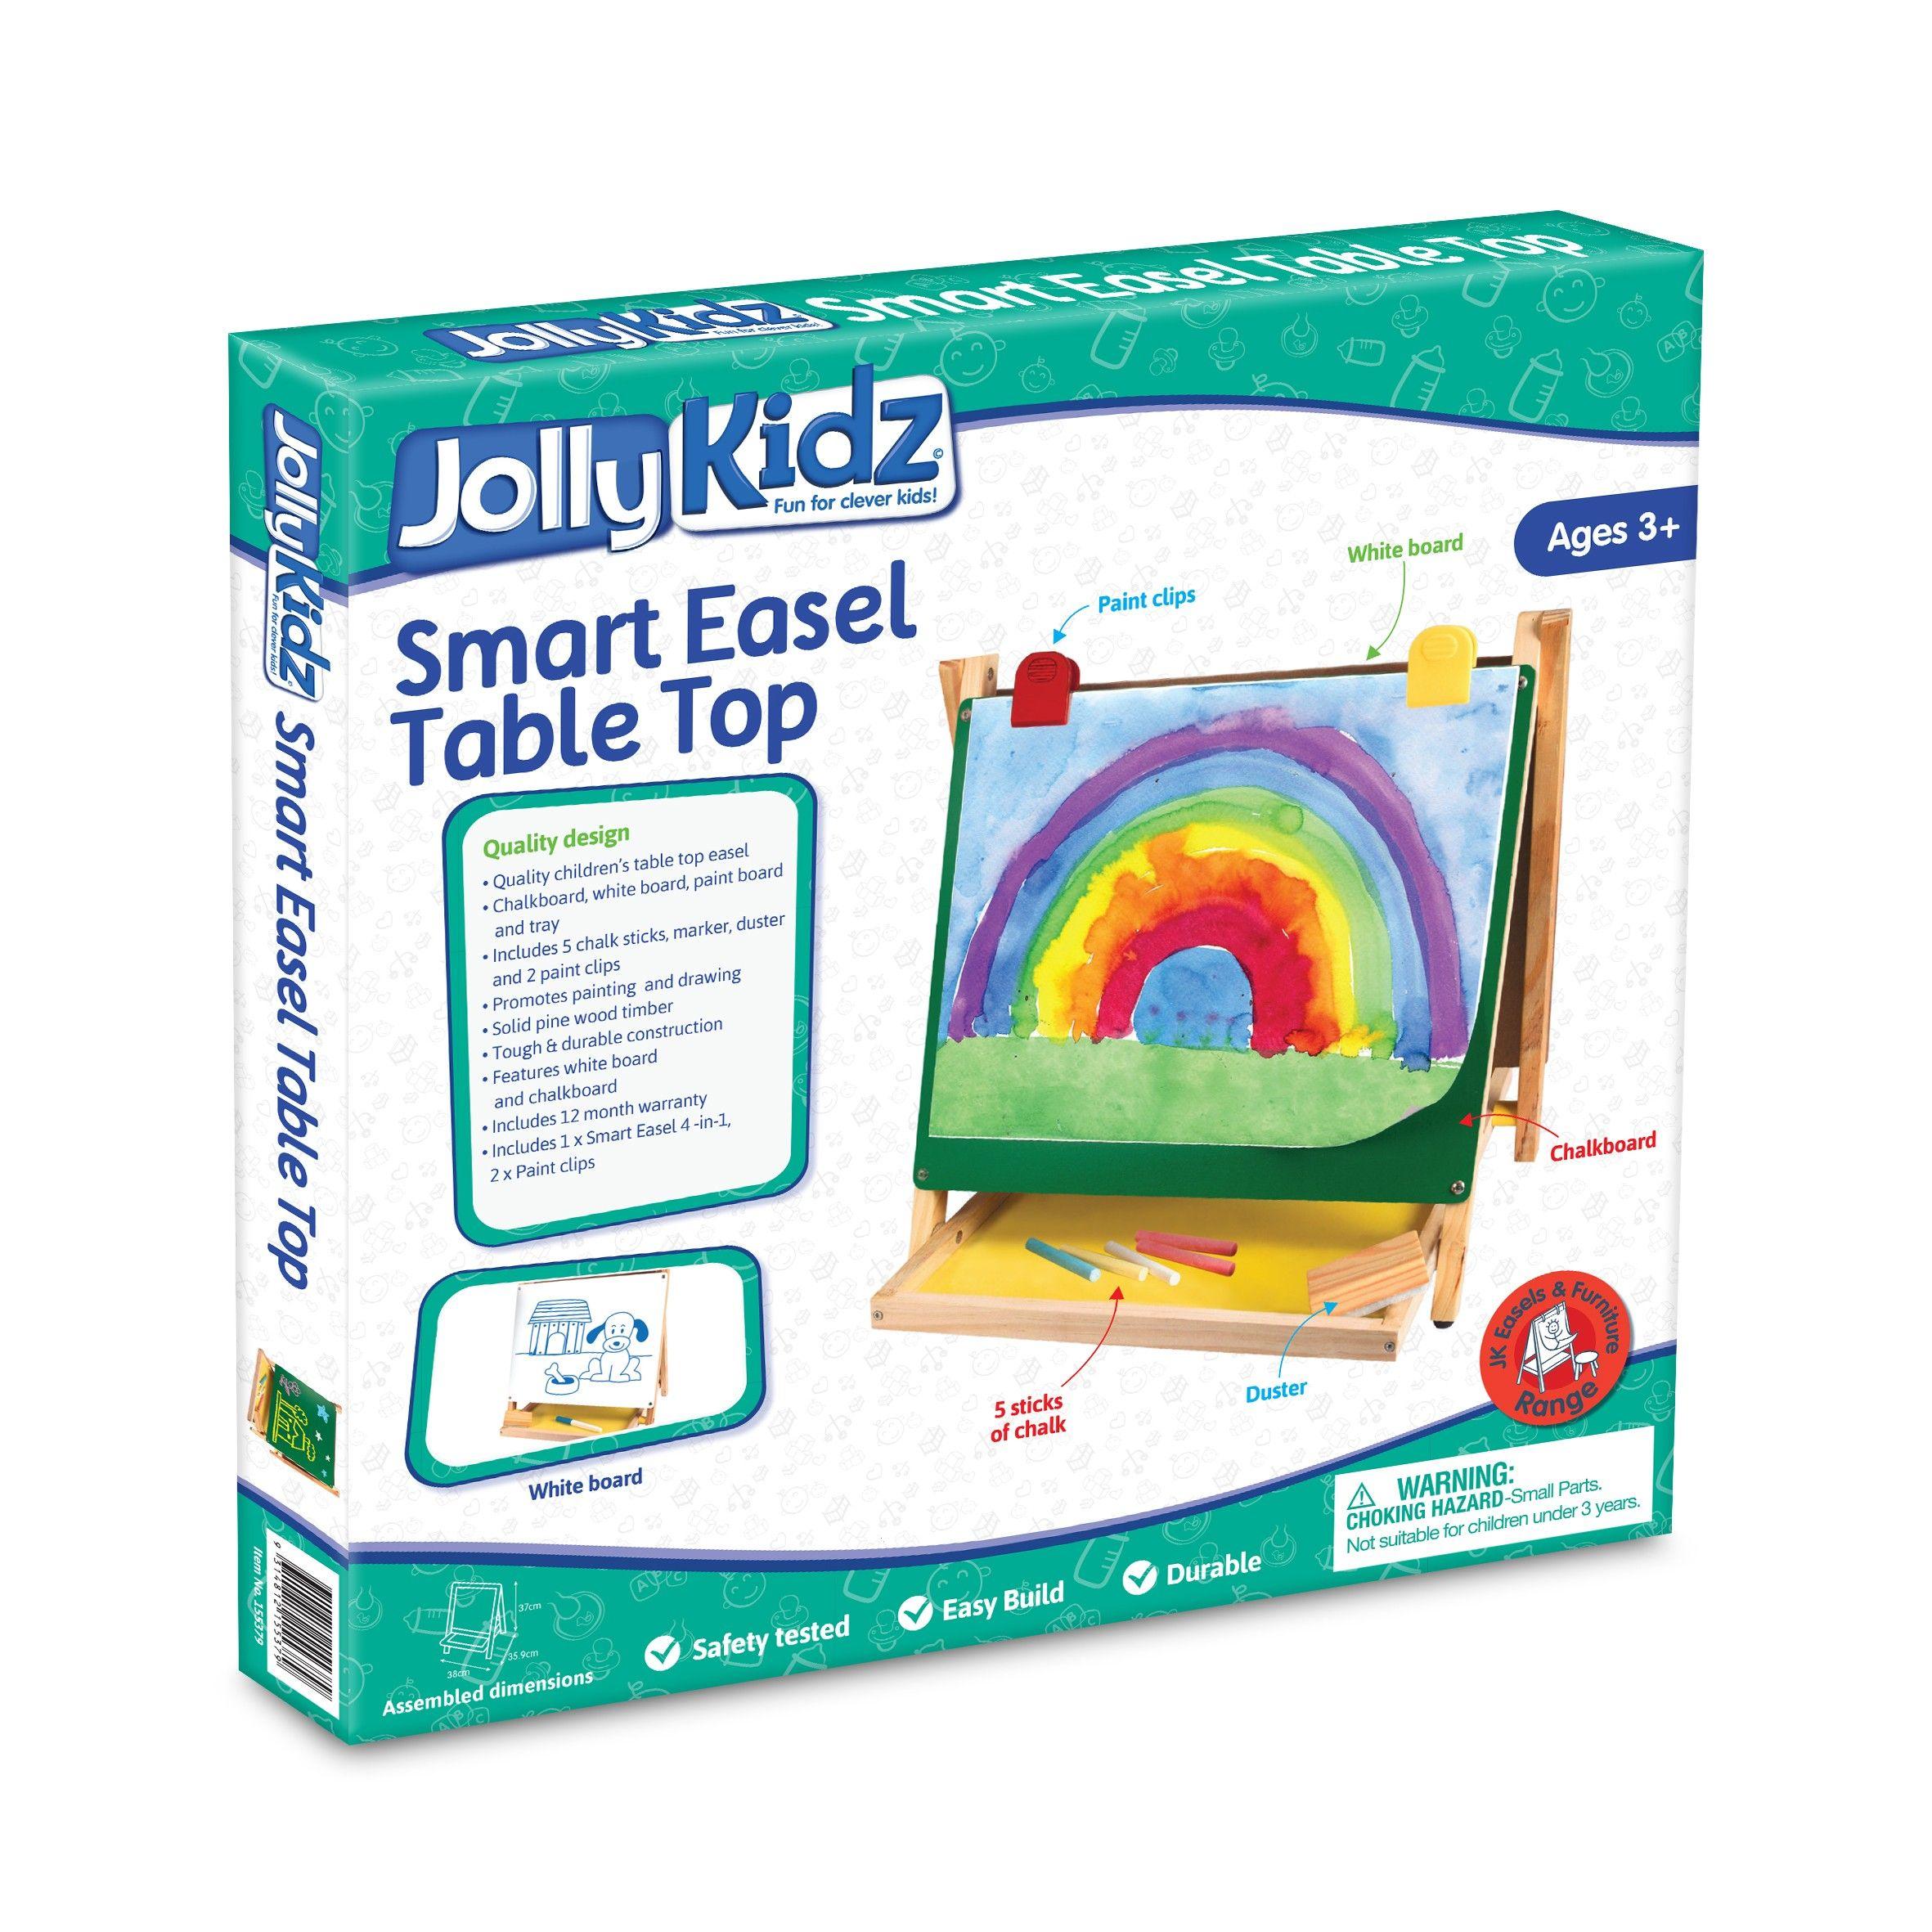 Jolly Kidz Smart Easel - Table Top - Colorific Education